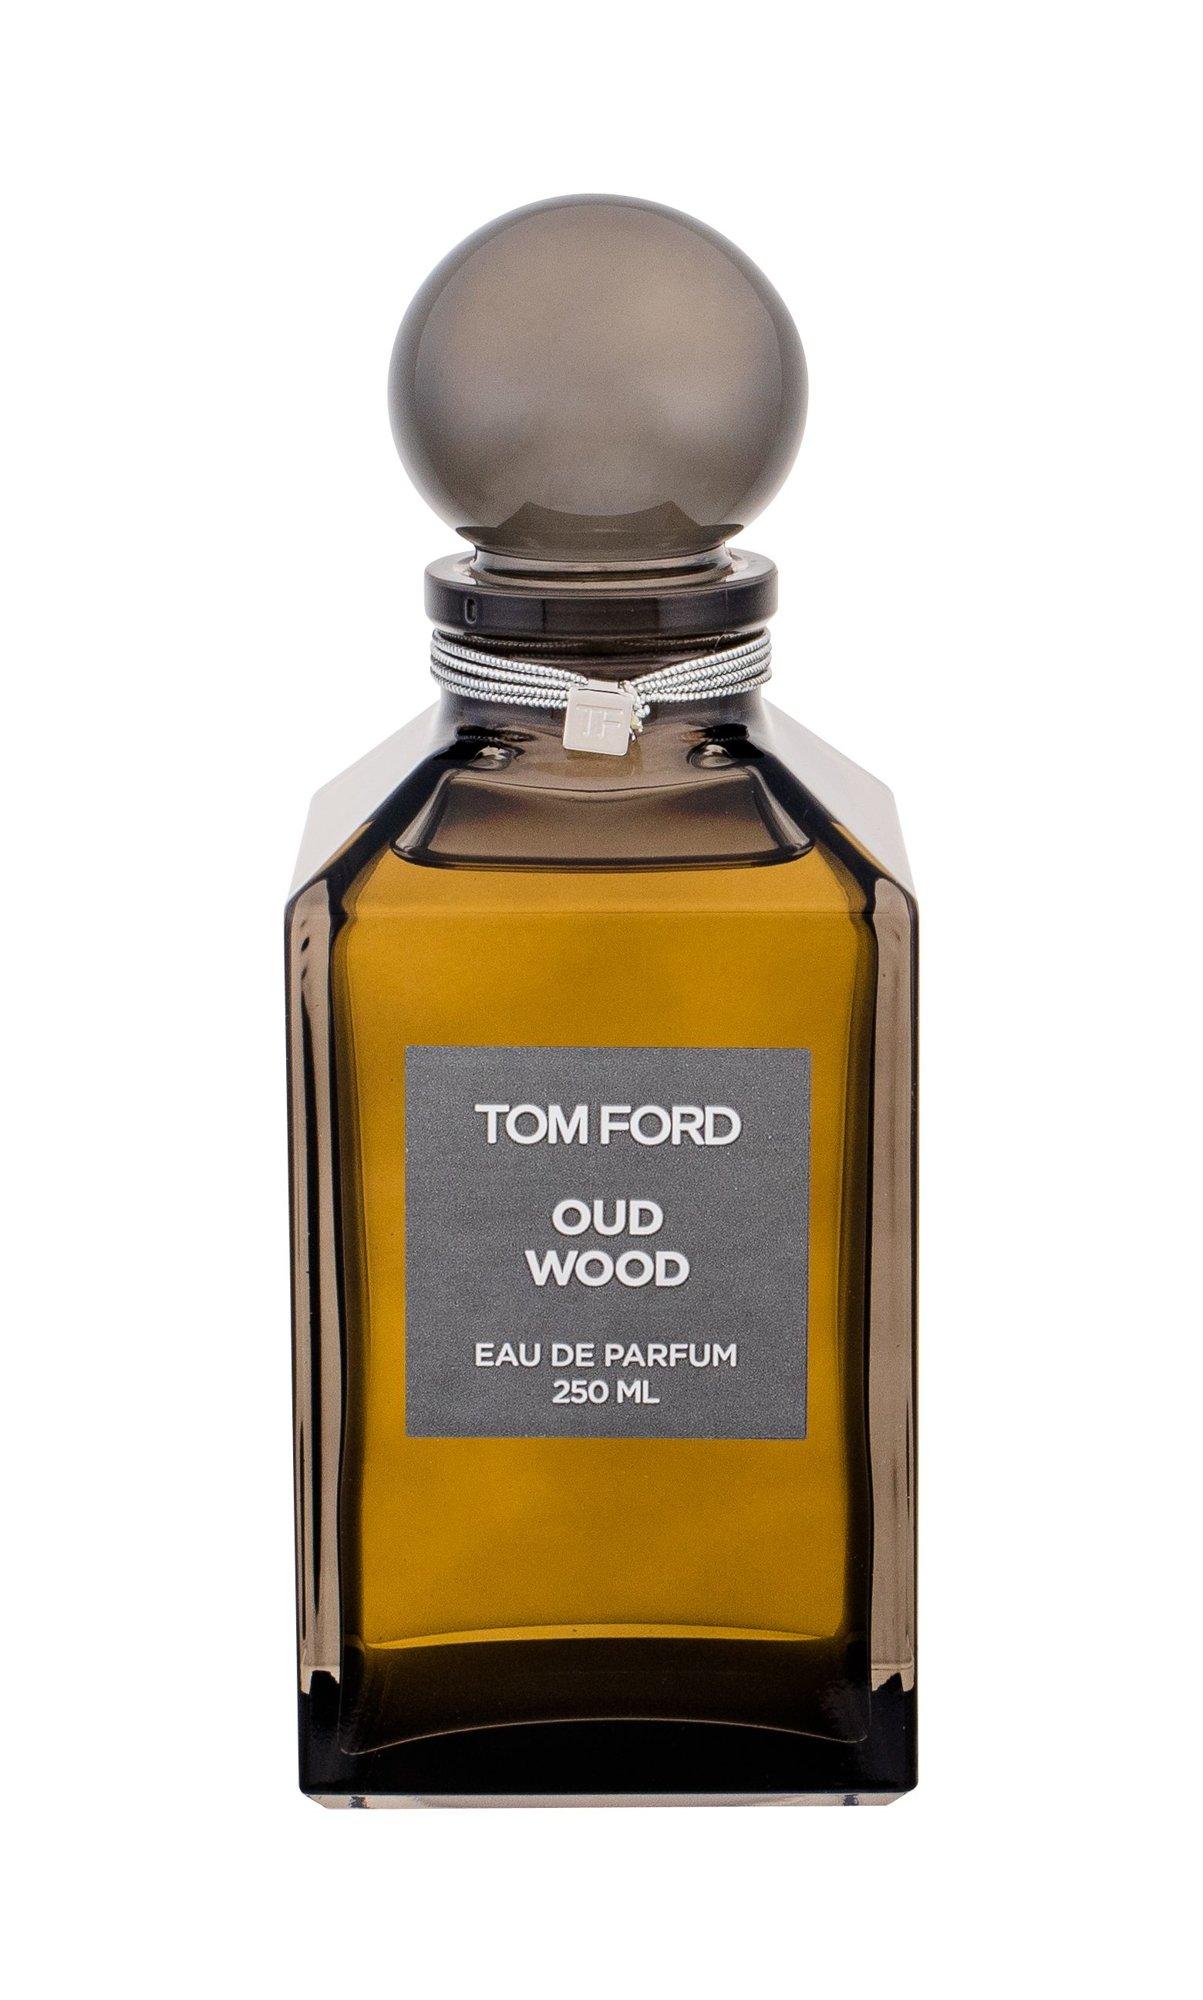 TOM FORD Oud Wood Eau de Parfum 250ml